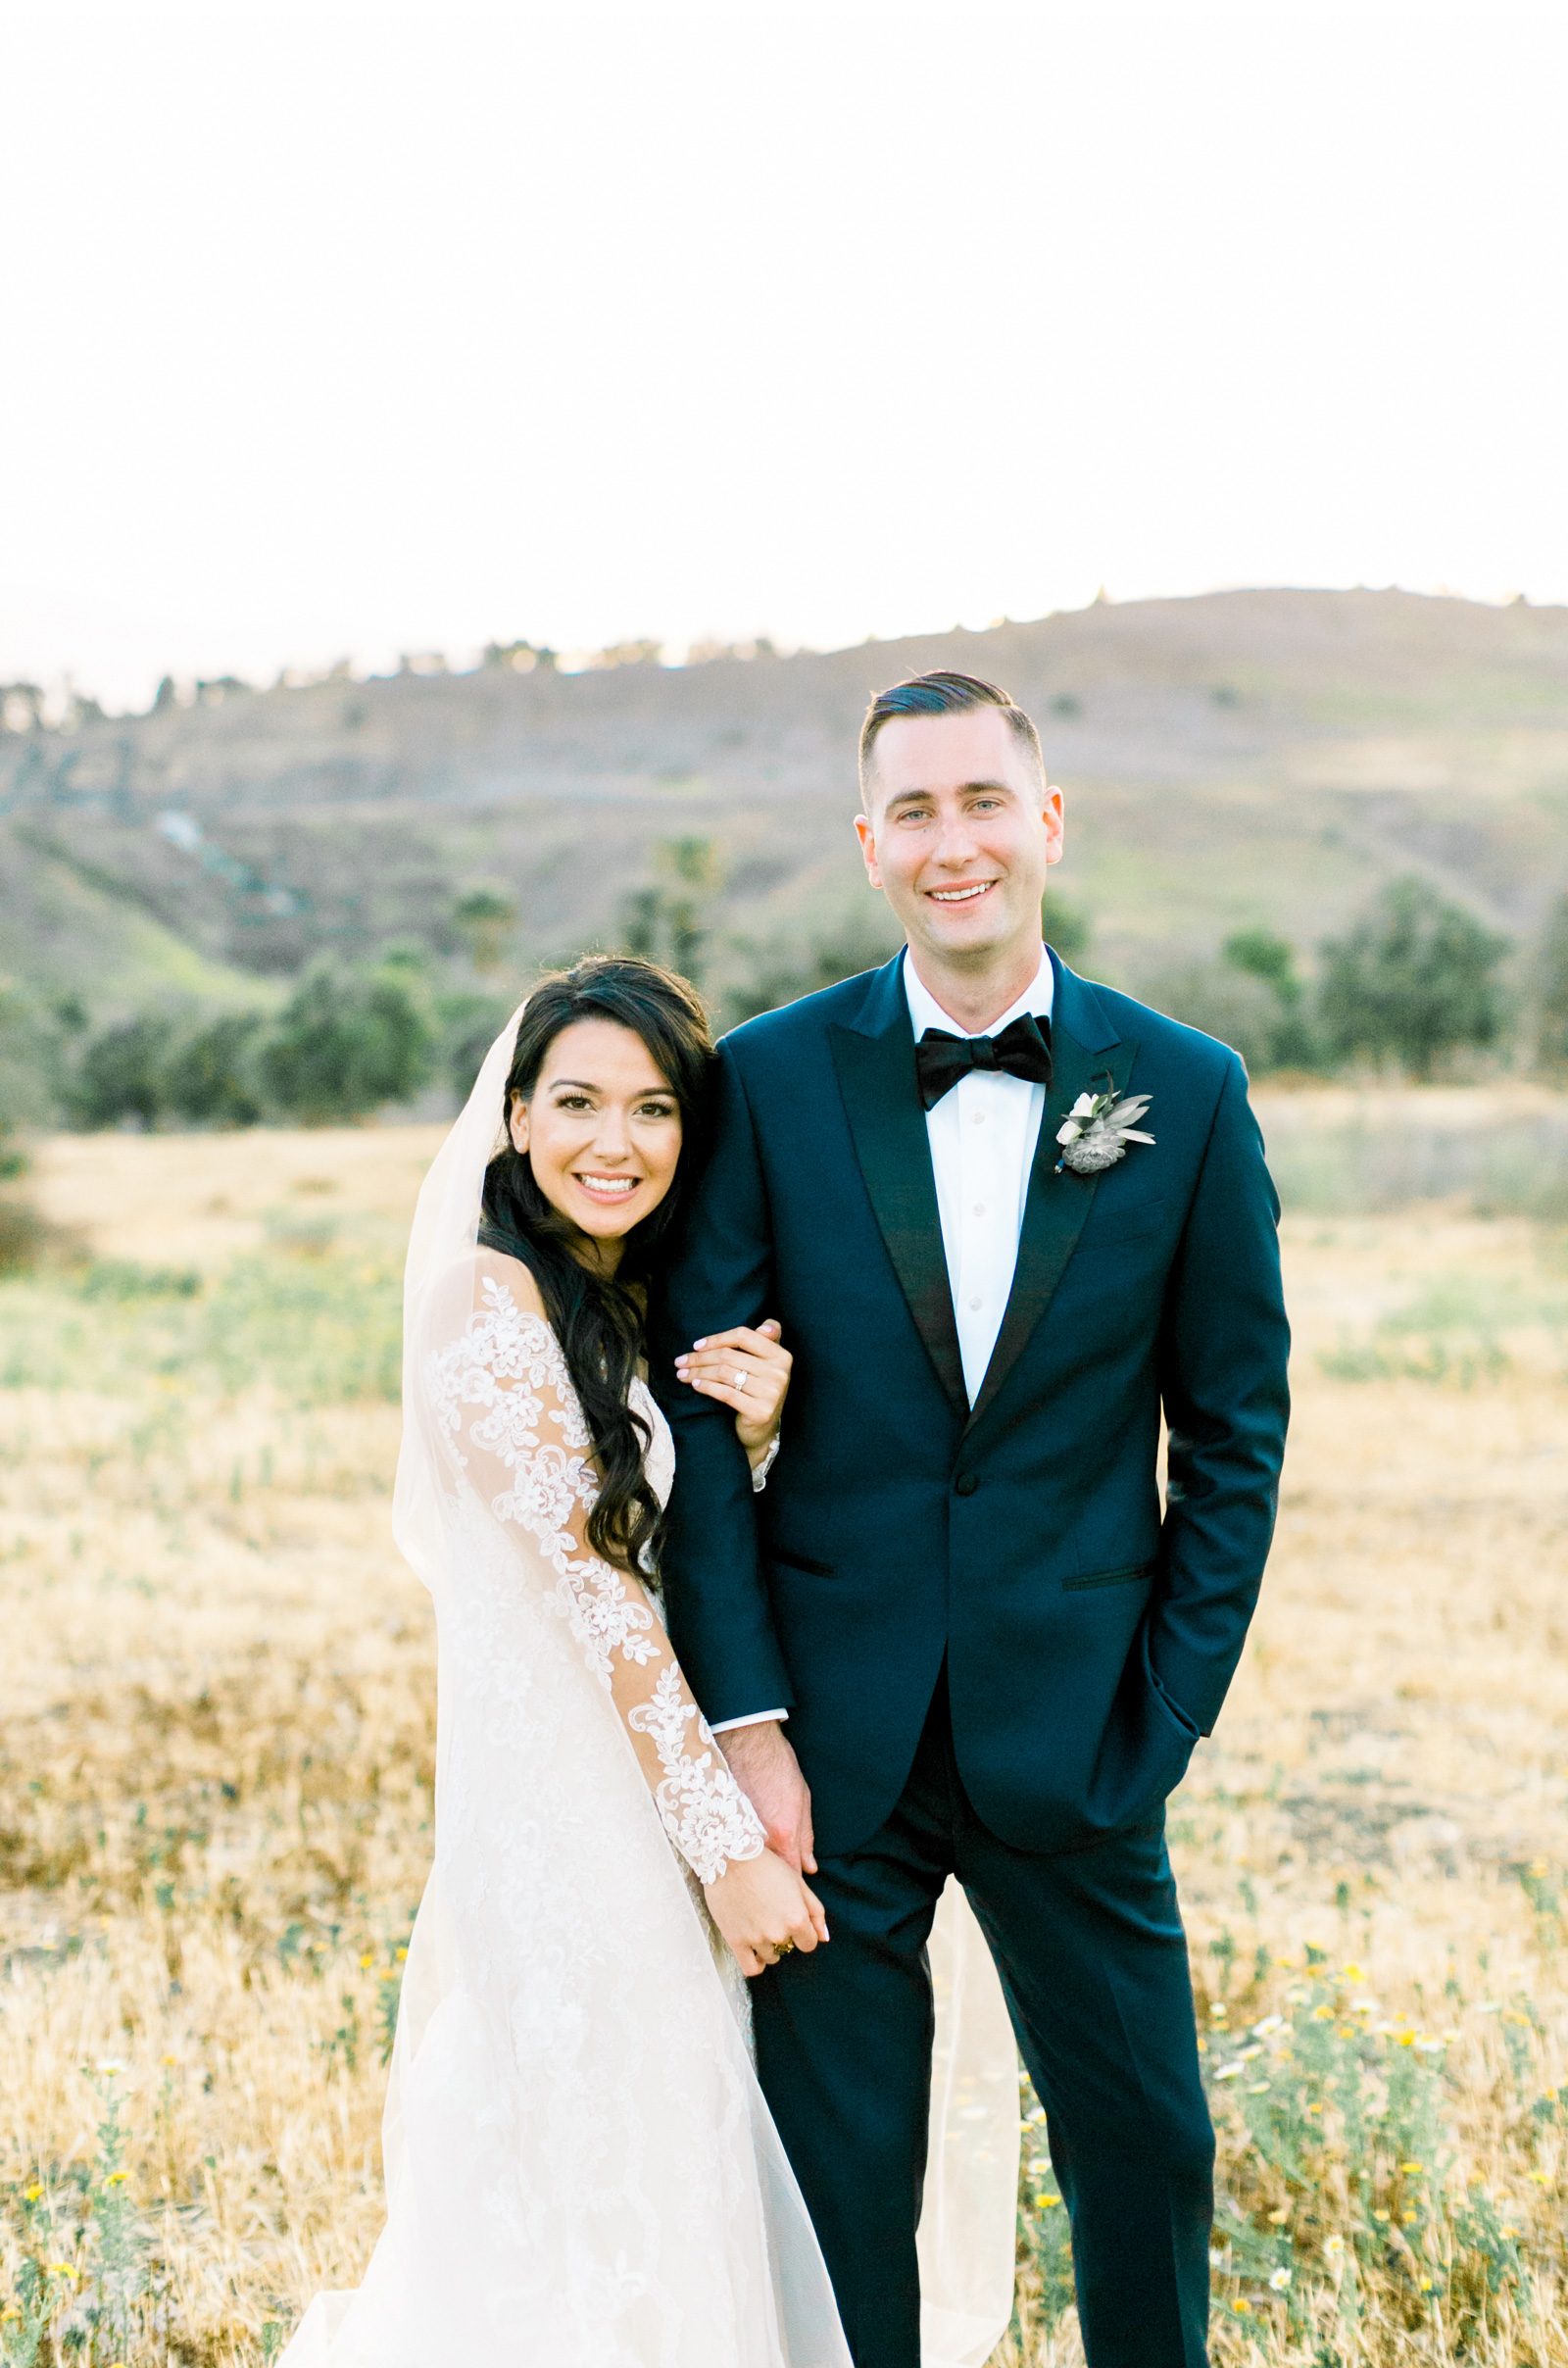 Malibu-Weddings-Natalie-Schutt-Photography_10.jpg